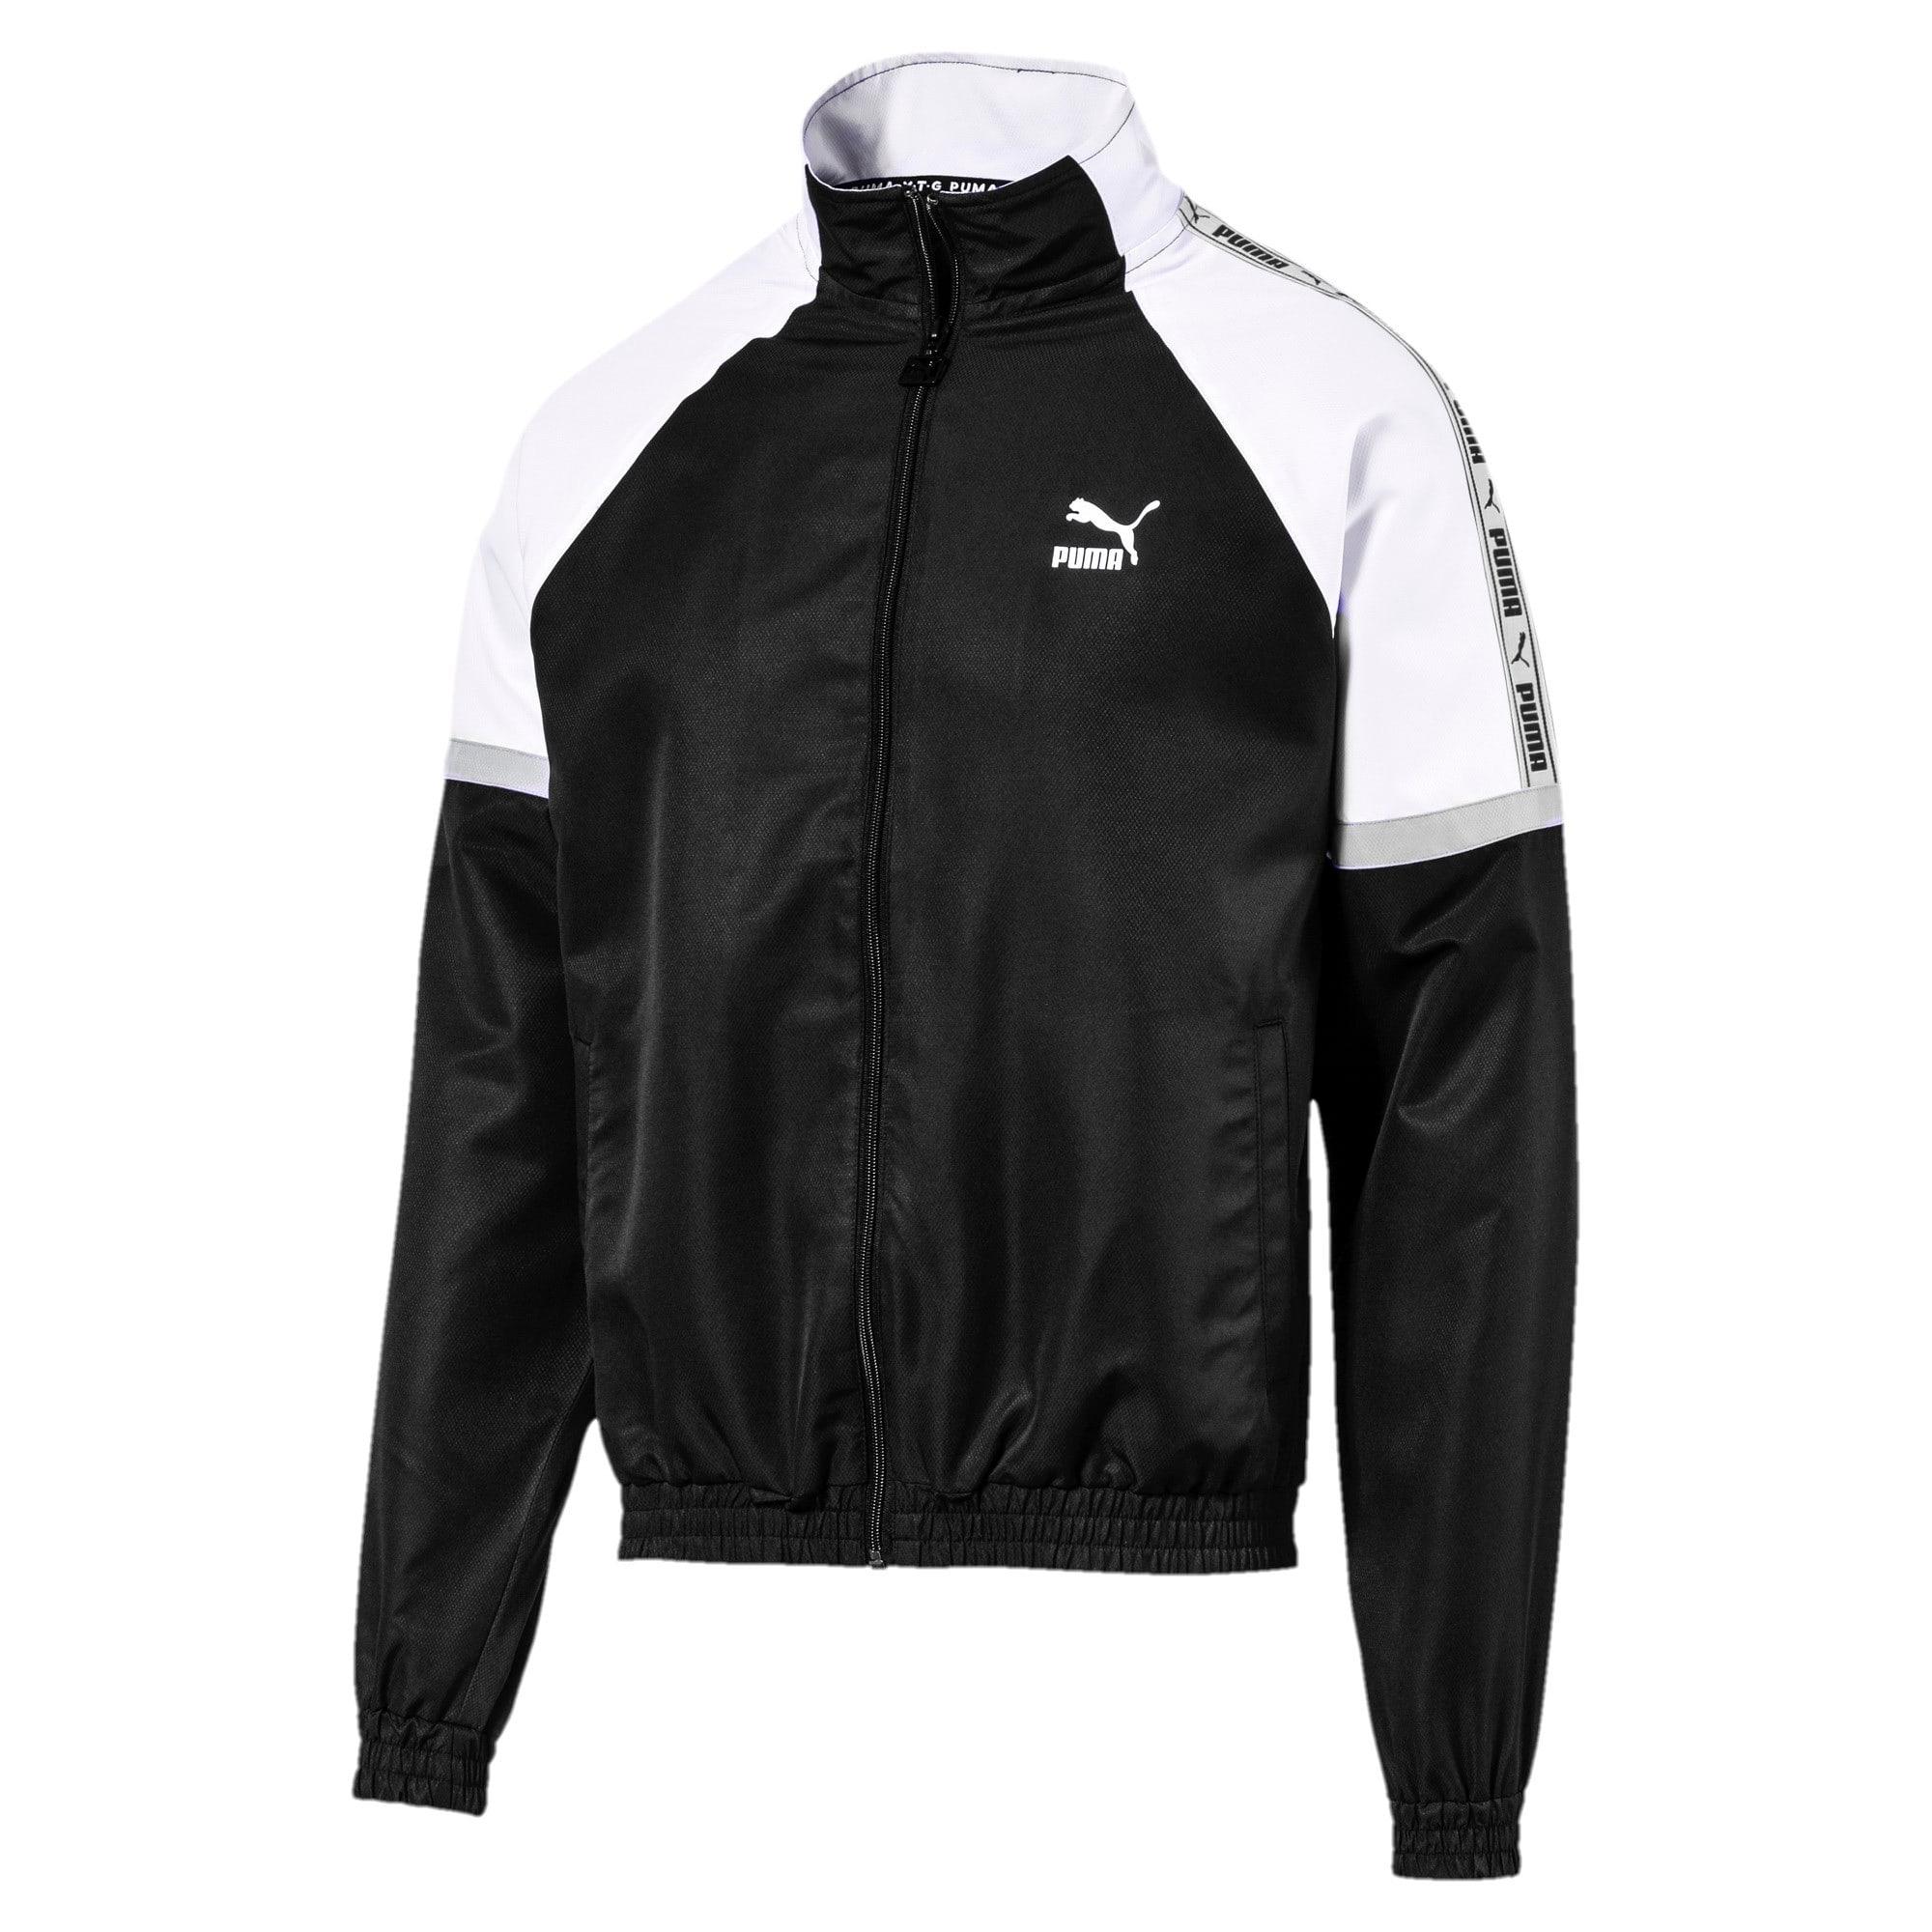 Thumbnail 5 of PUMA XTG Full Zip Men's Woven Jacket, Puma Black-Puma white, medium